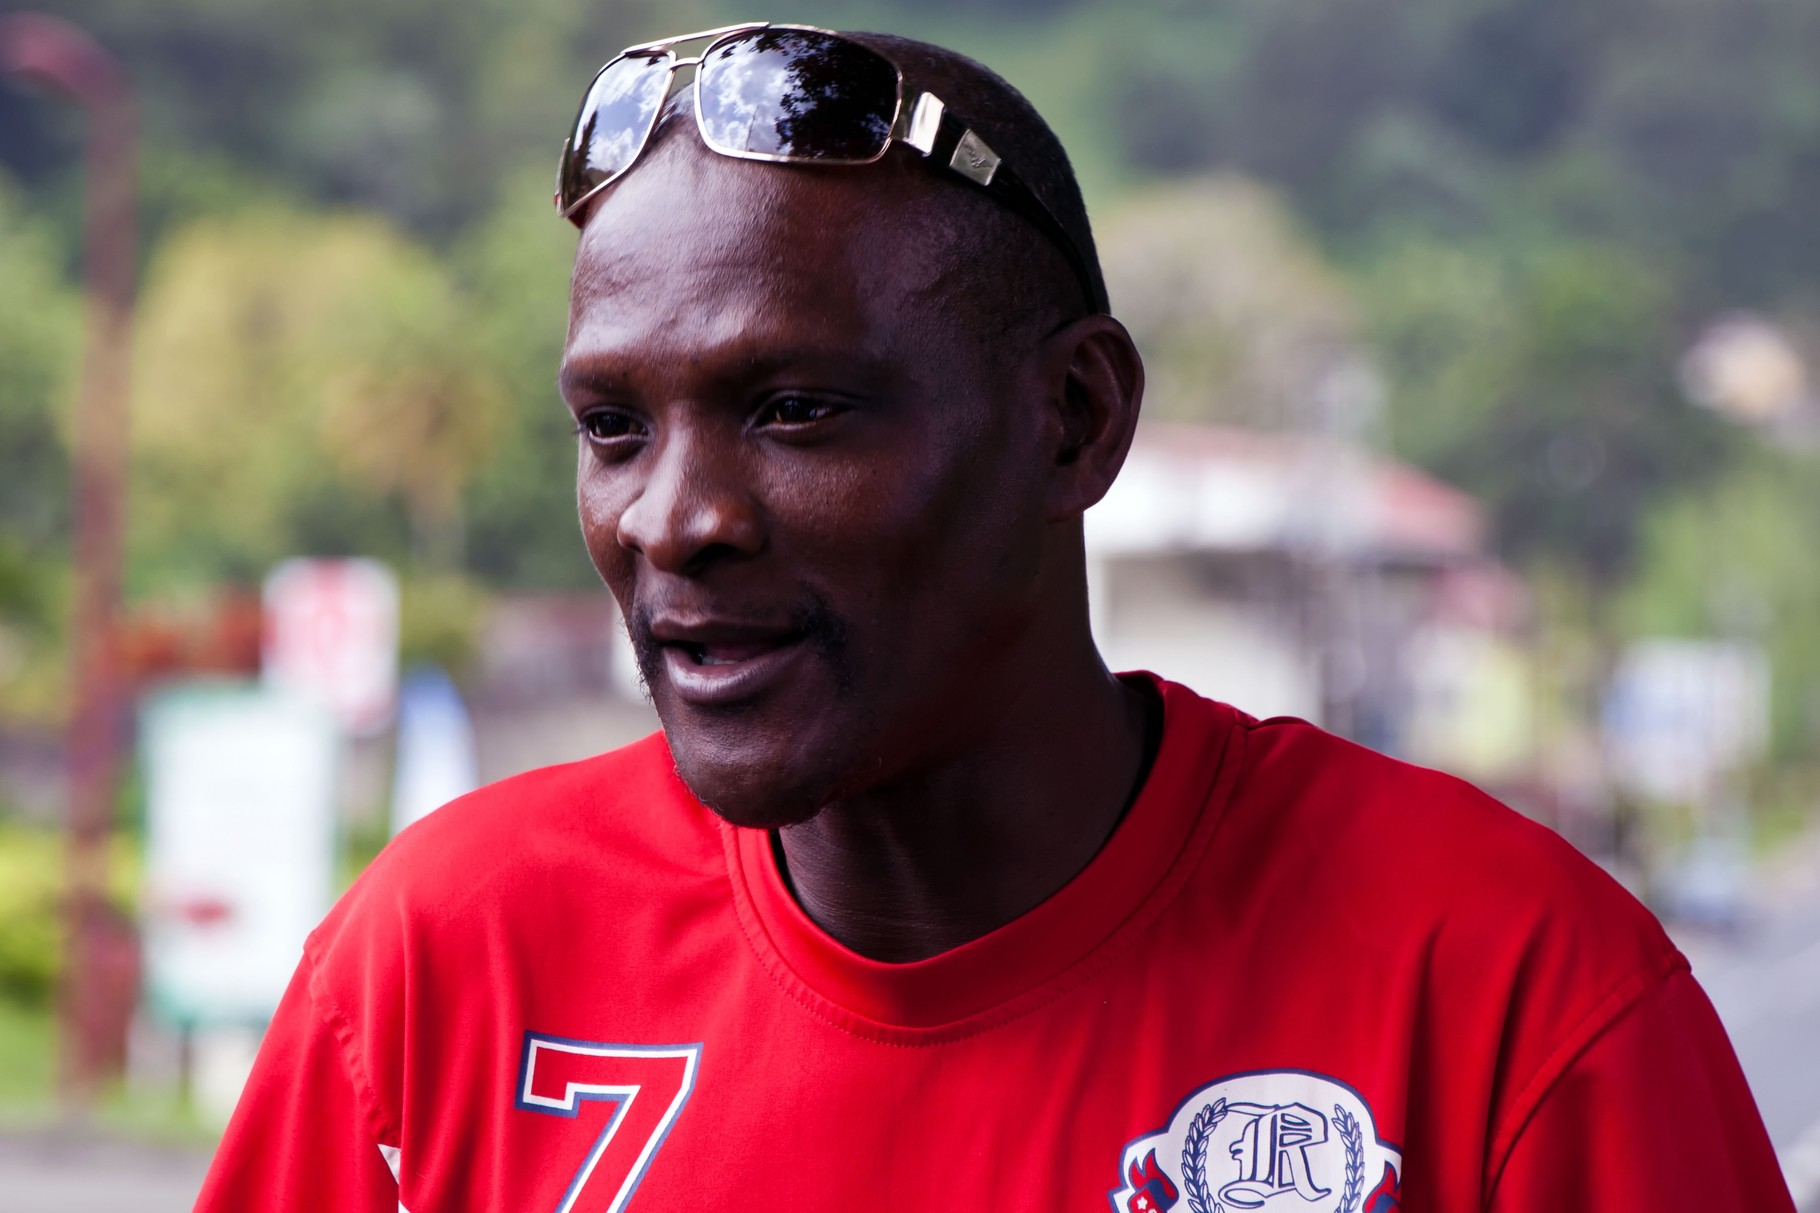 Martinique Mike der Taxifahrer